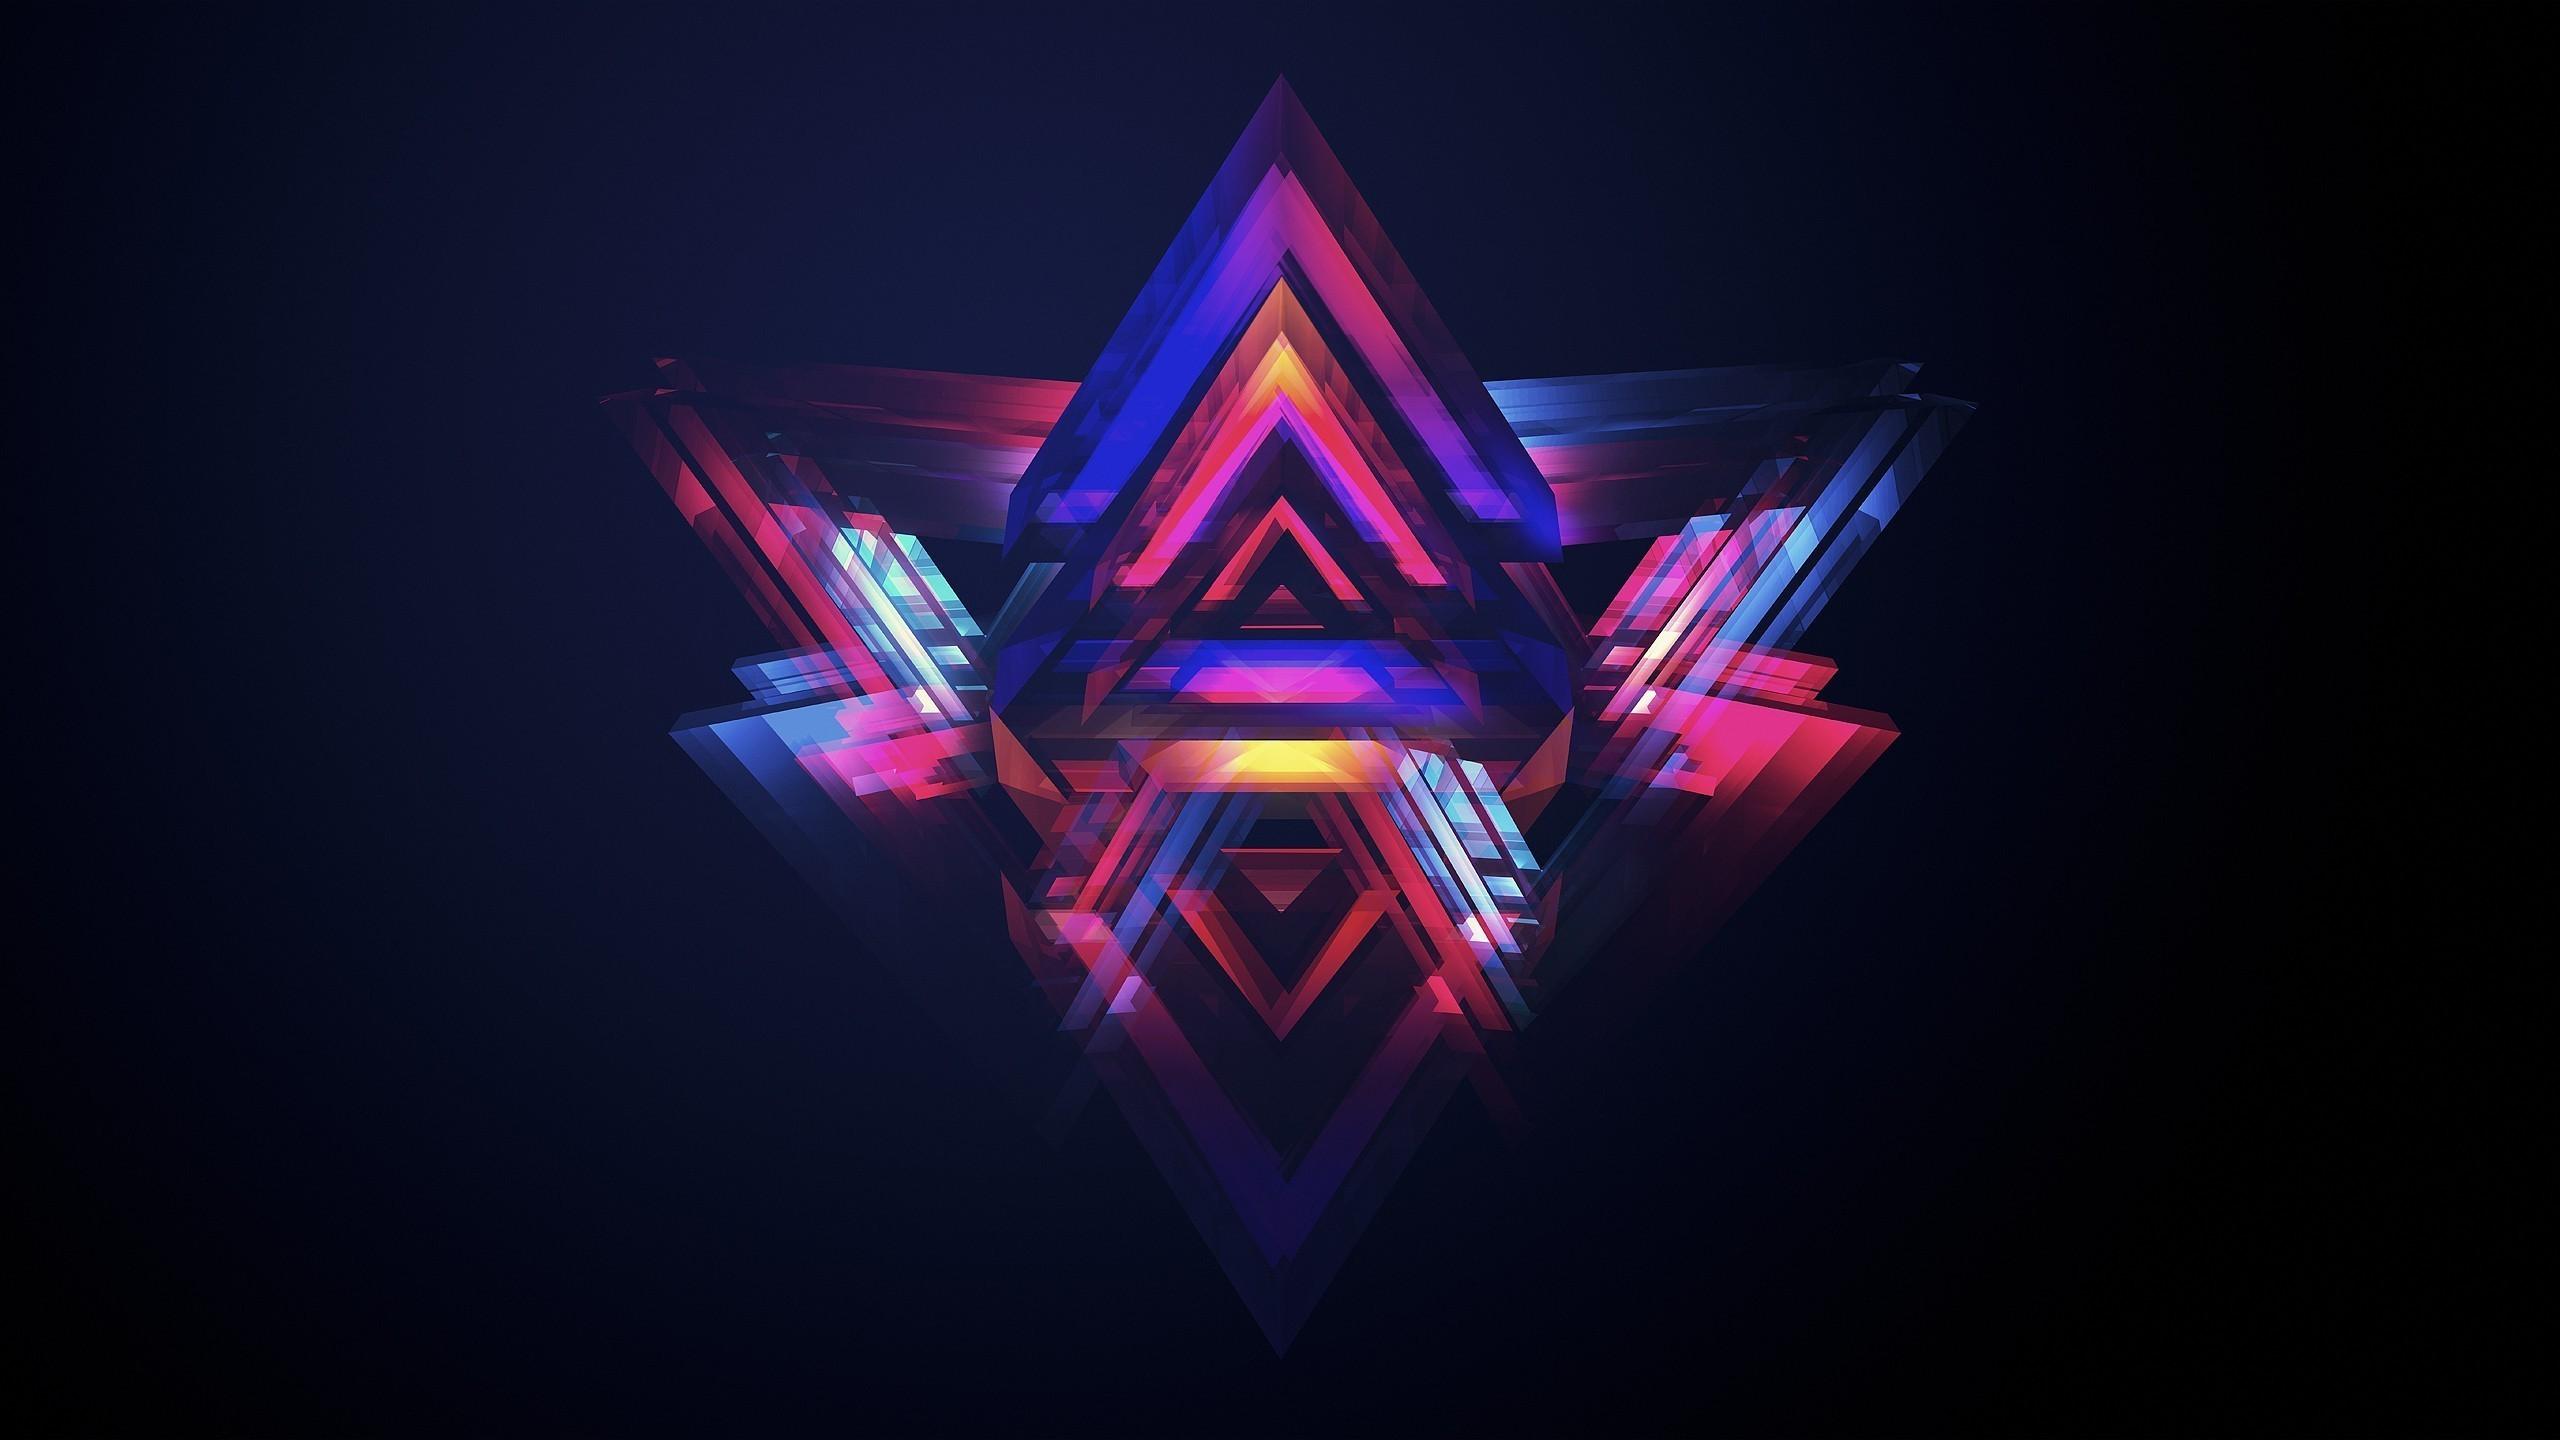 HD Neon Wallpaper (63+ Images